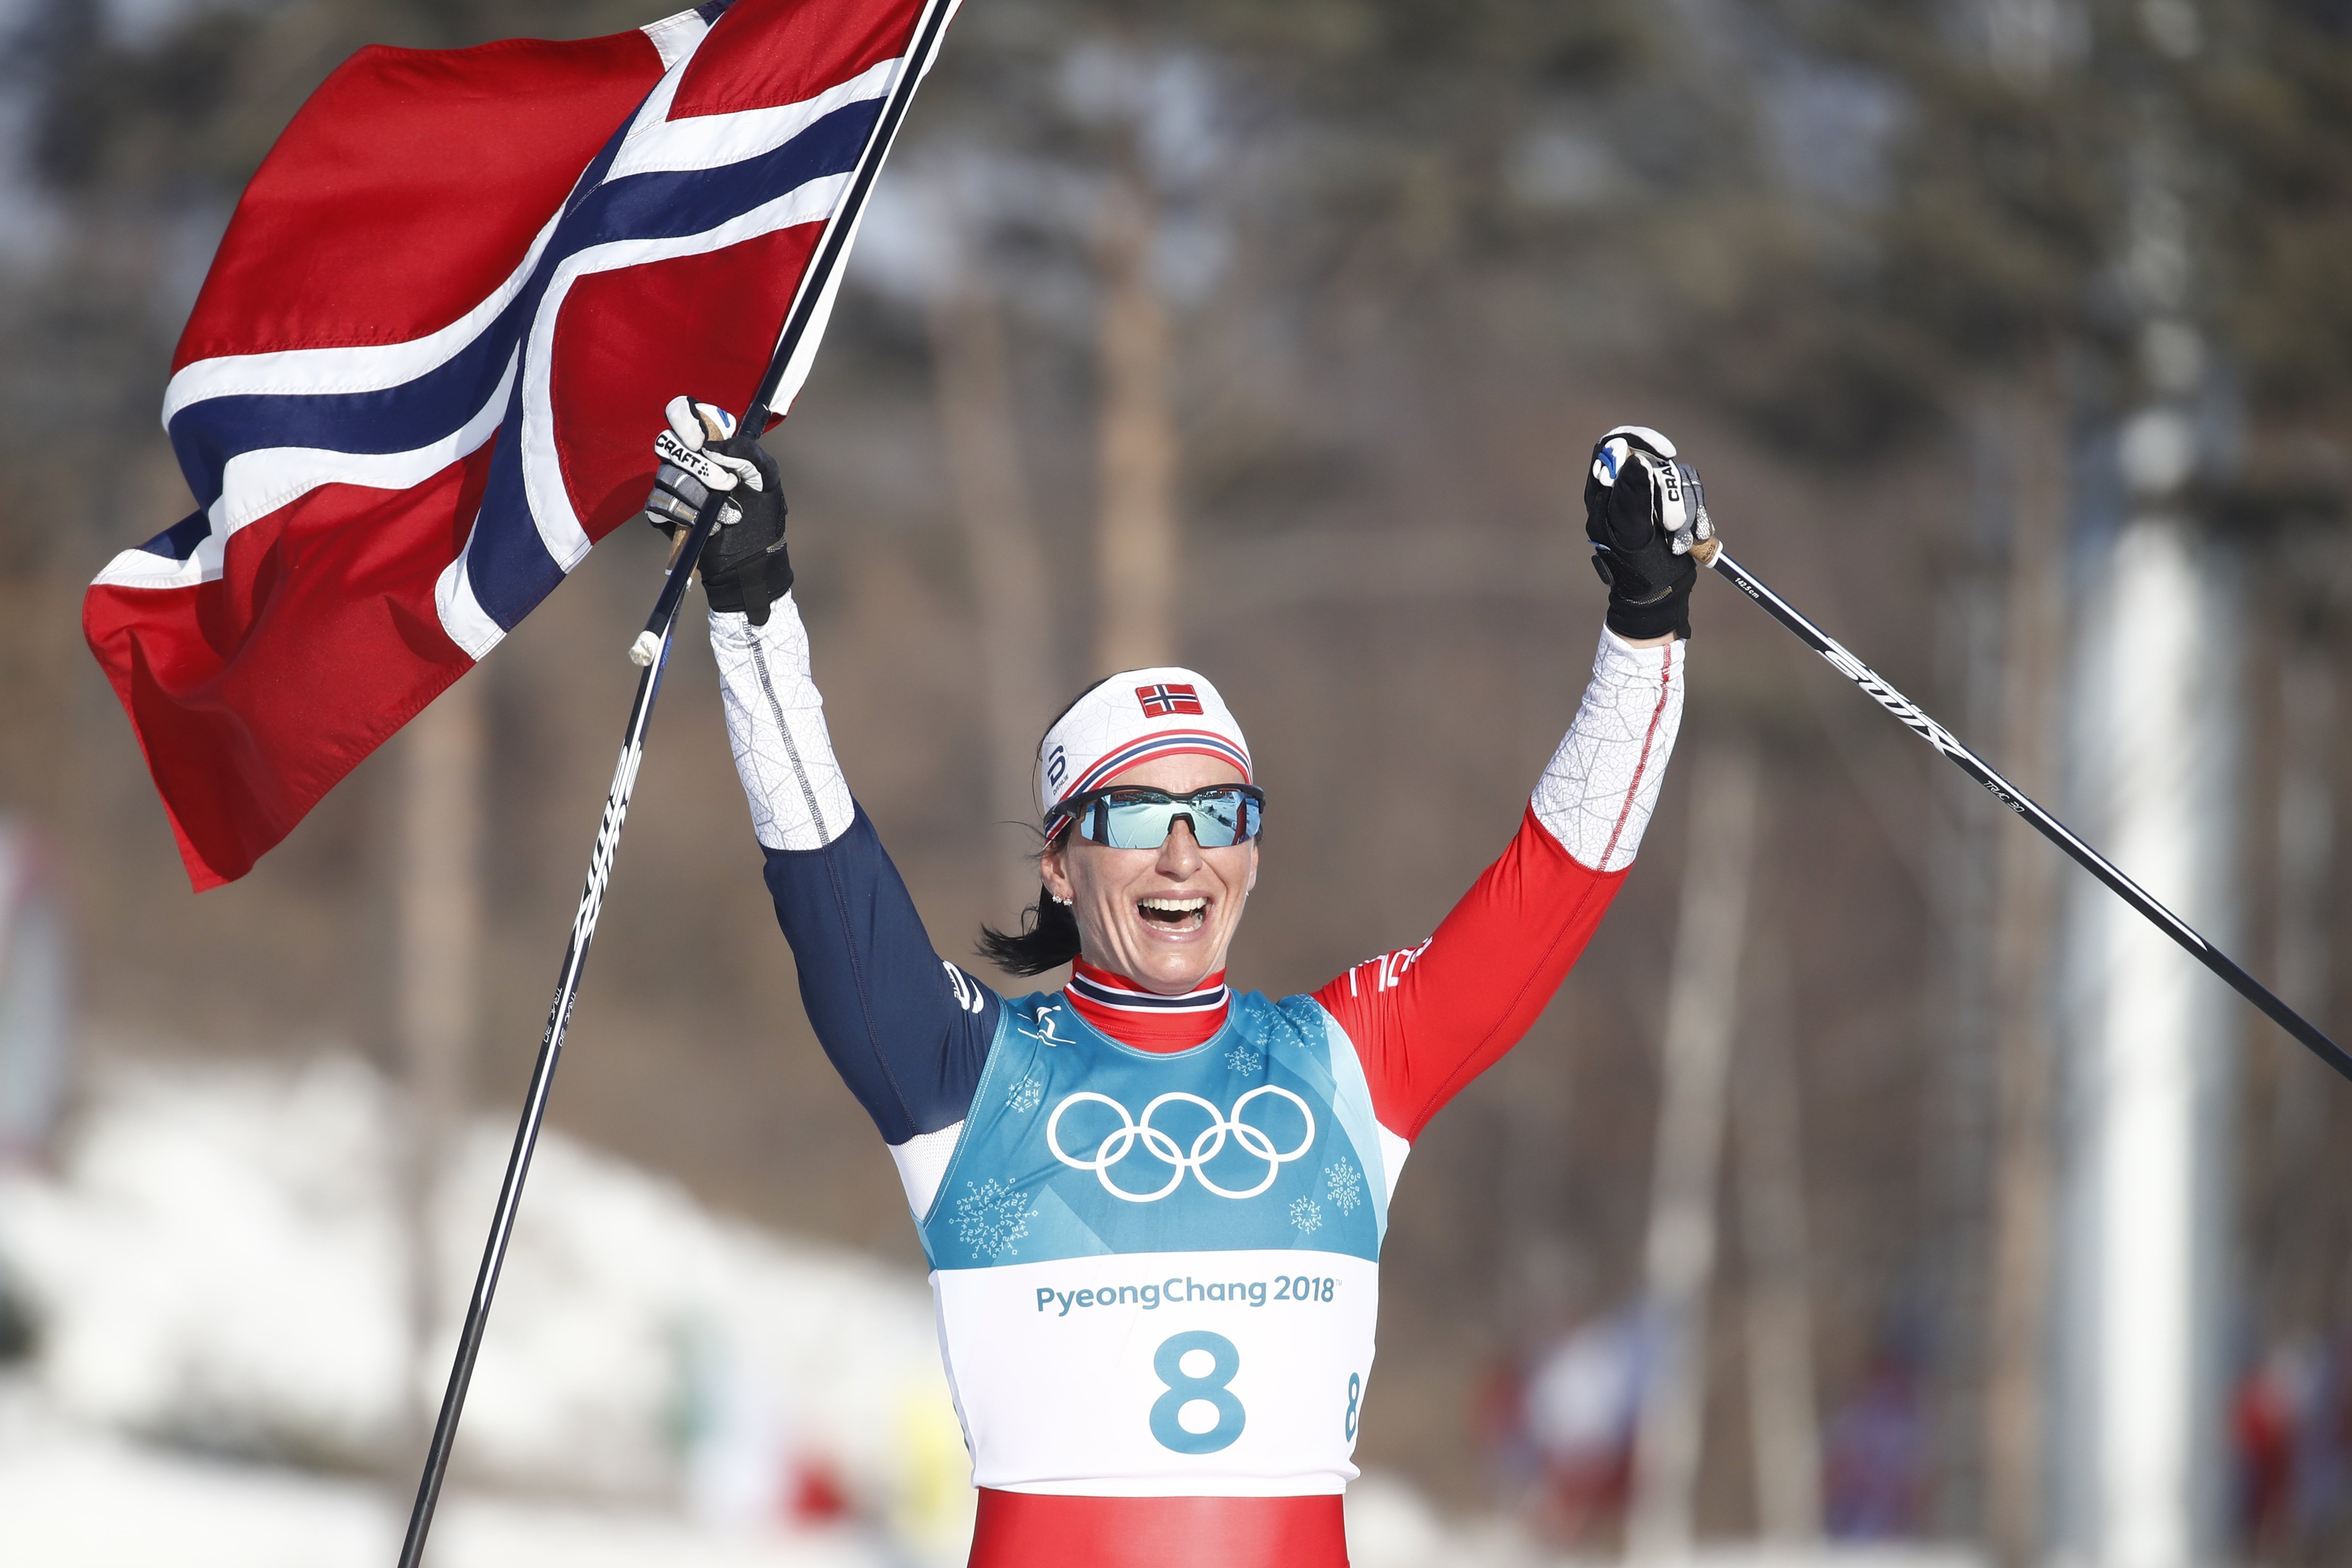 Marit Bjorgen caps historic Olympics with more history